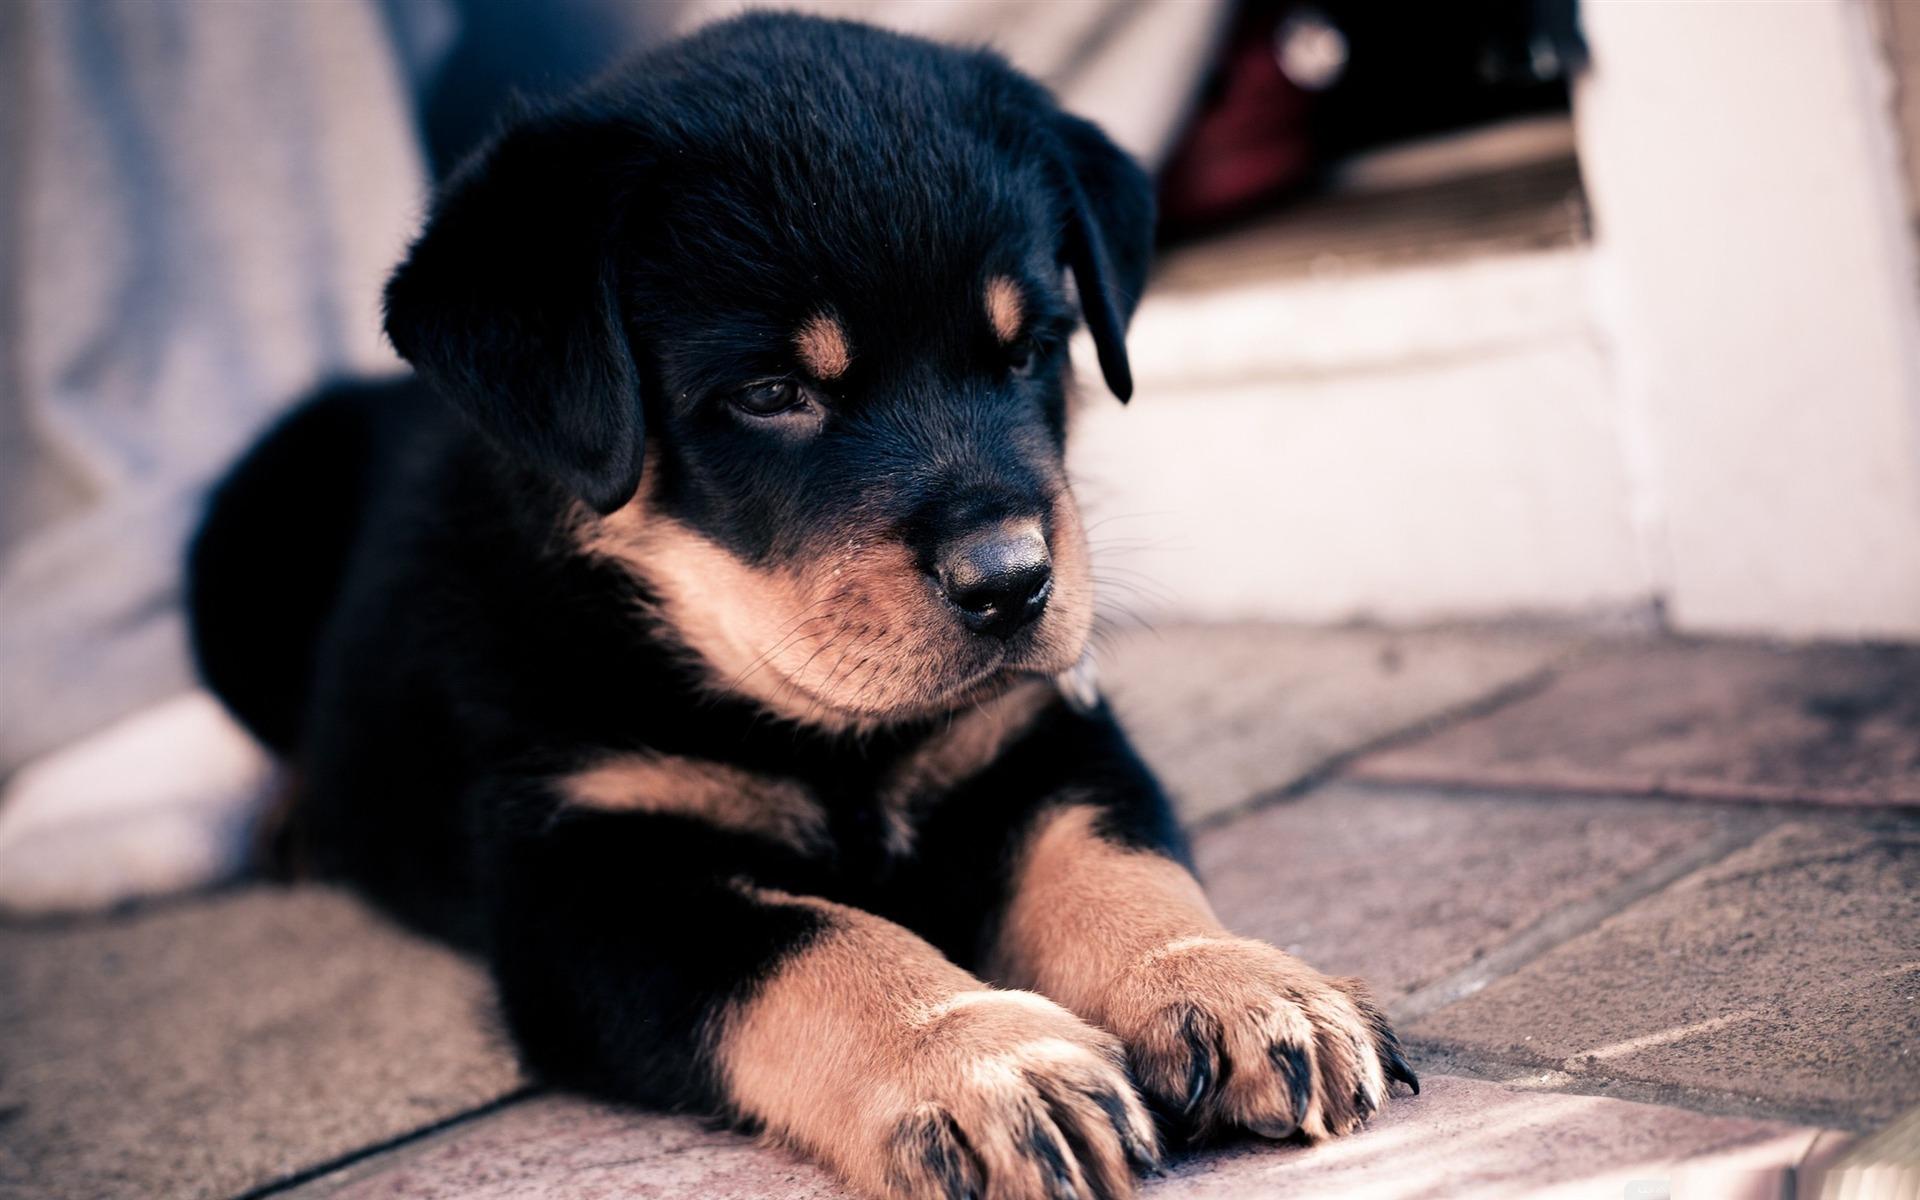 cute rottweiler puppy-dog animal desktop wallpaper ...